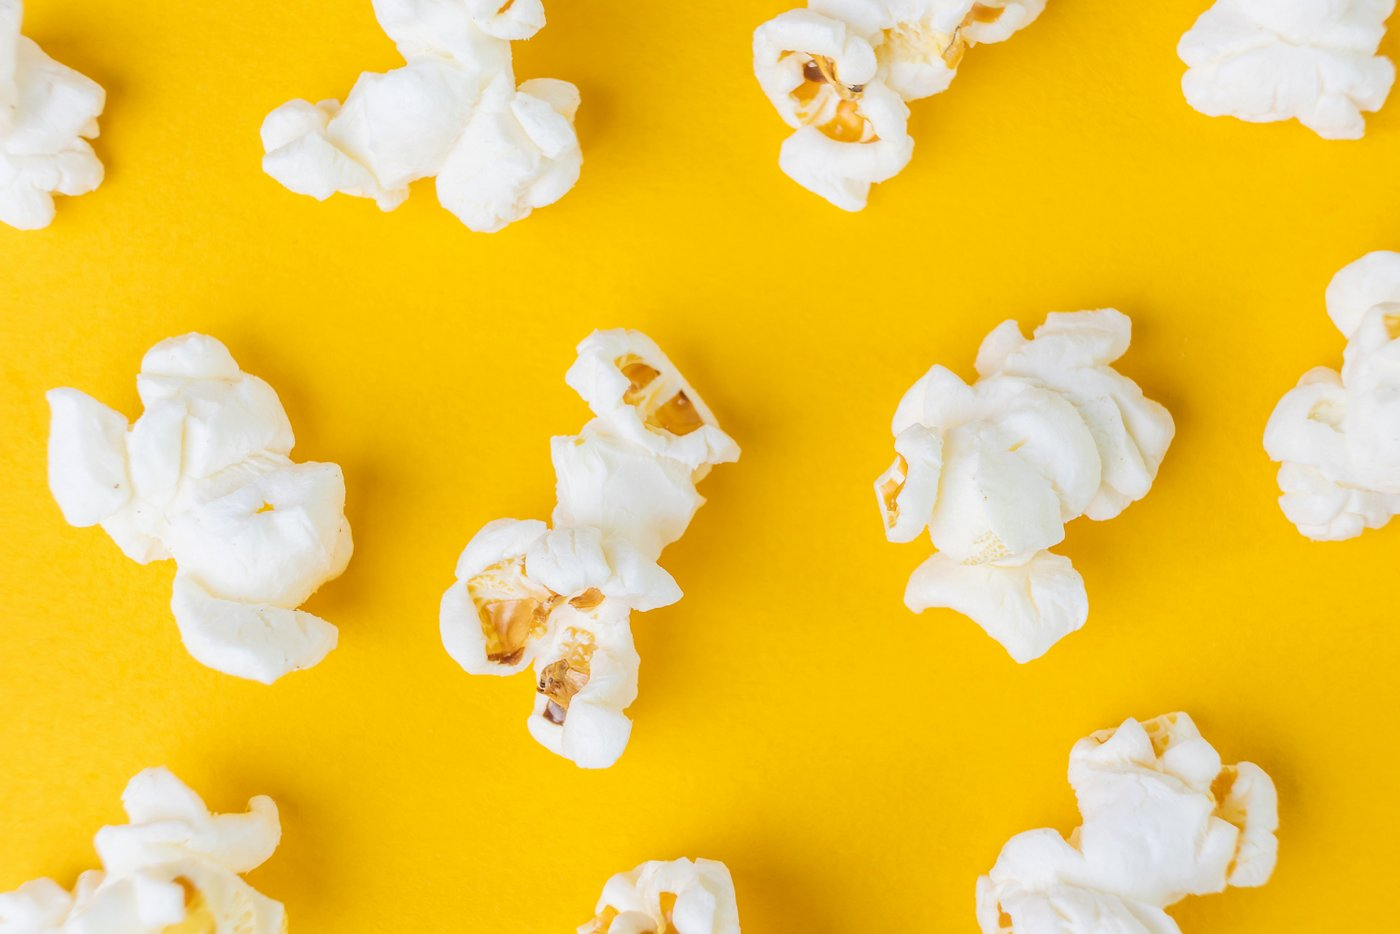 Popped kernels of popcorn